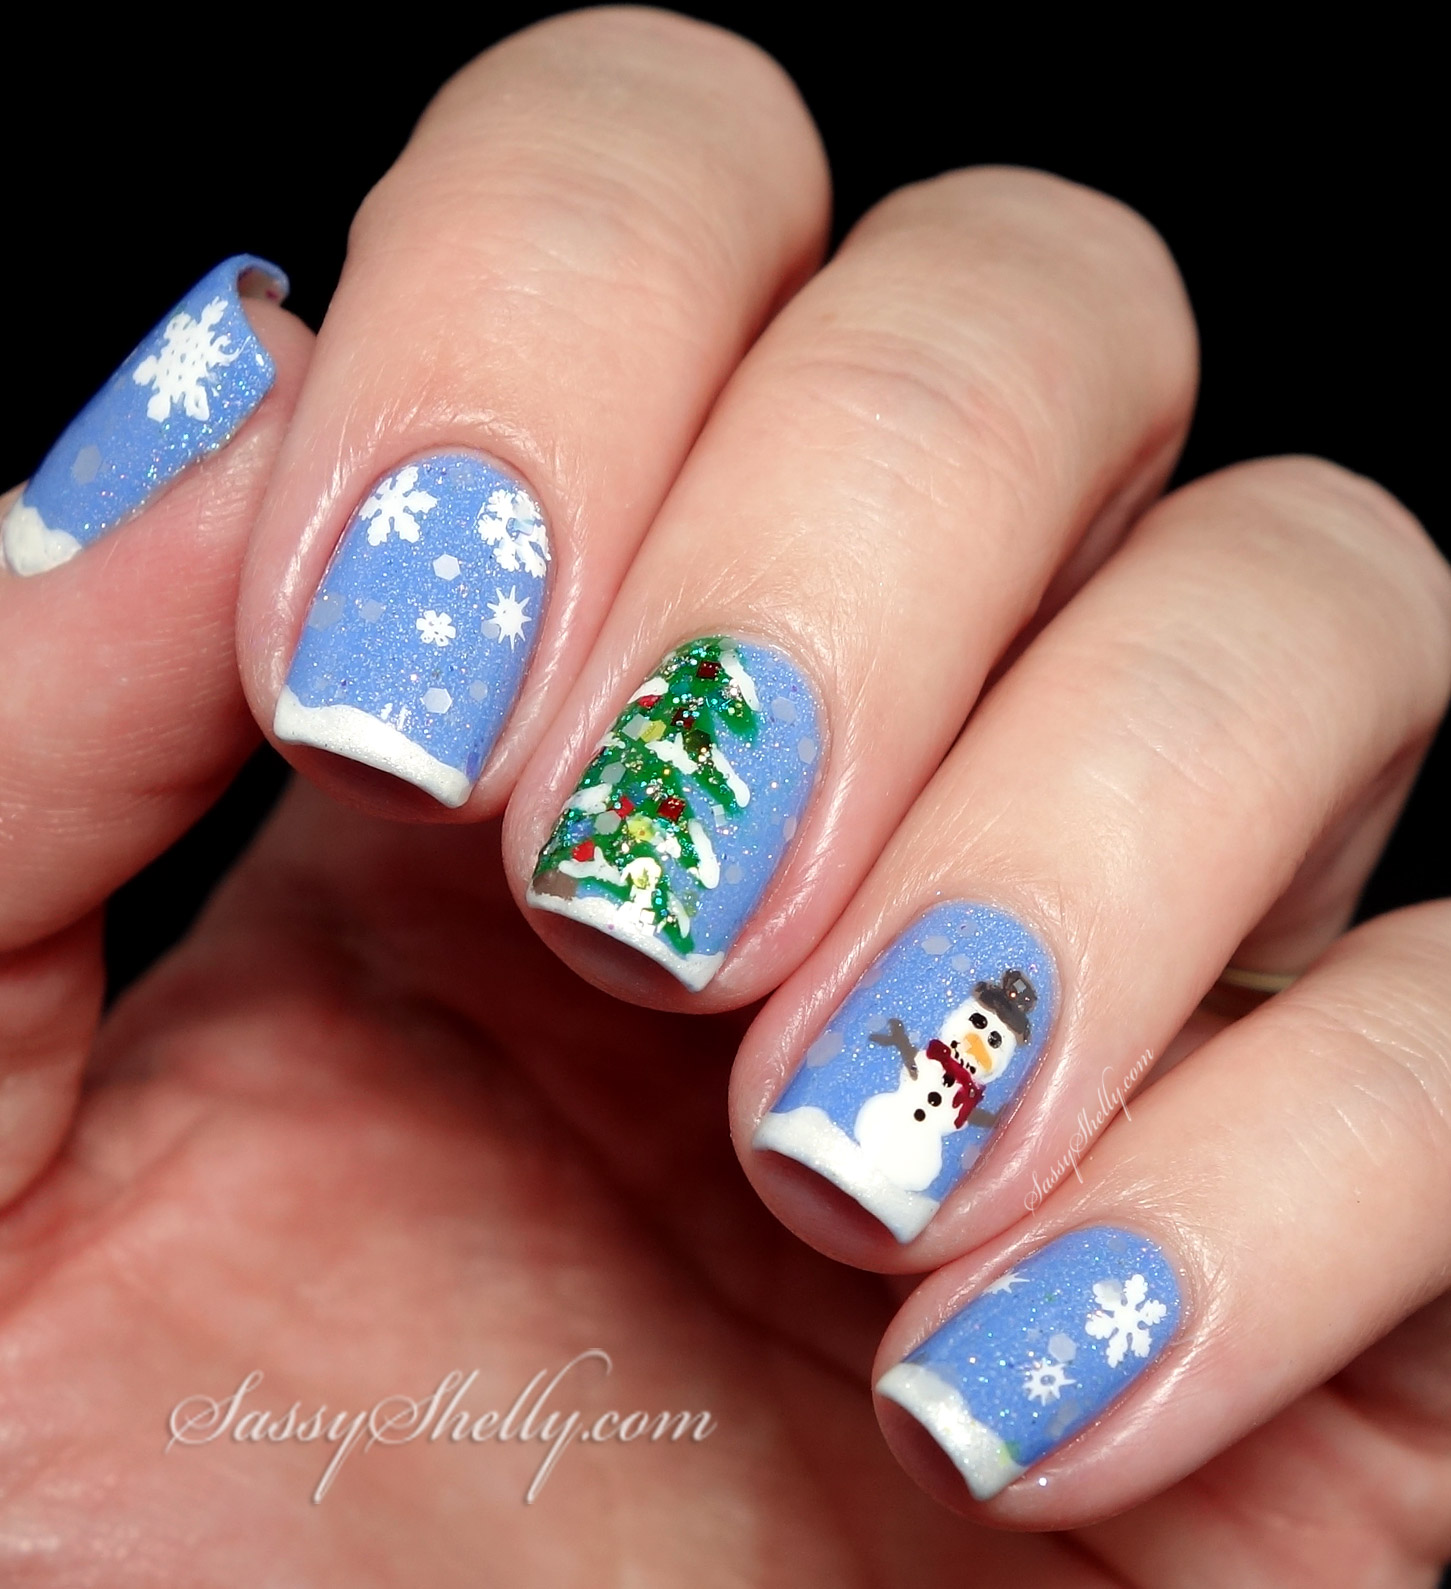 Christmas Nails Arts: Christmas Tree & Snowman Nail Art With